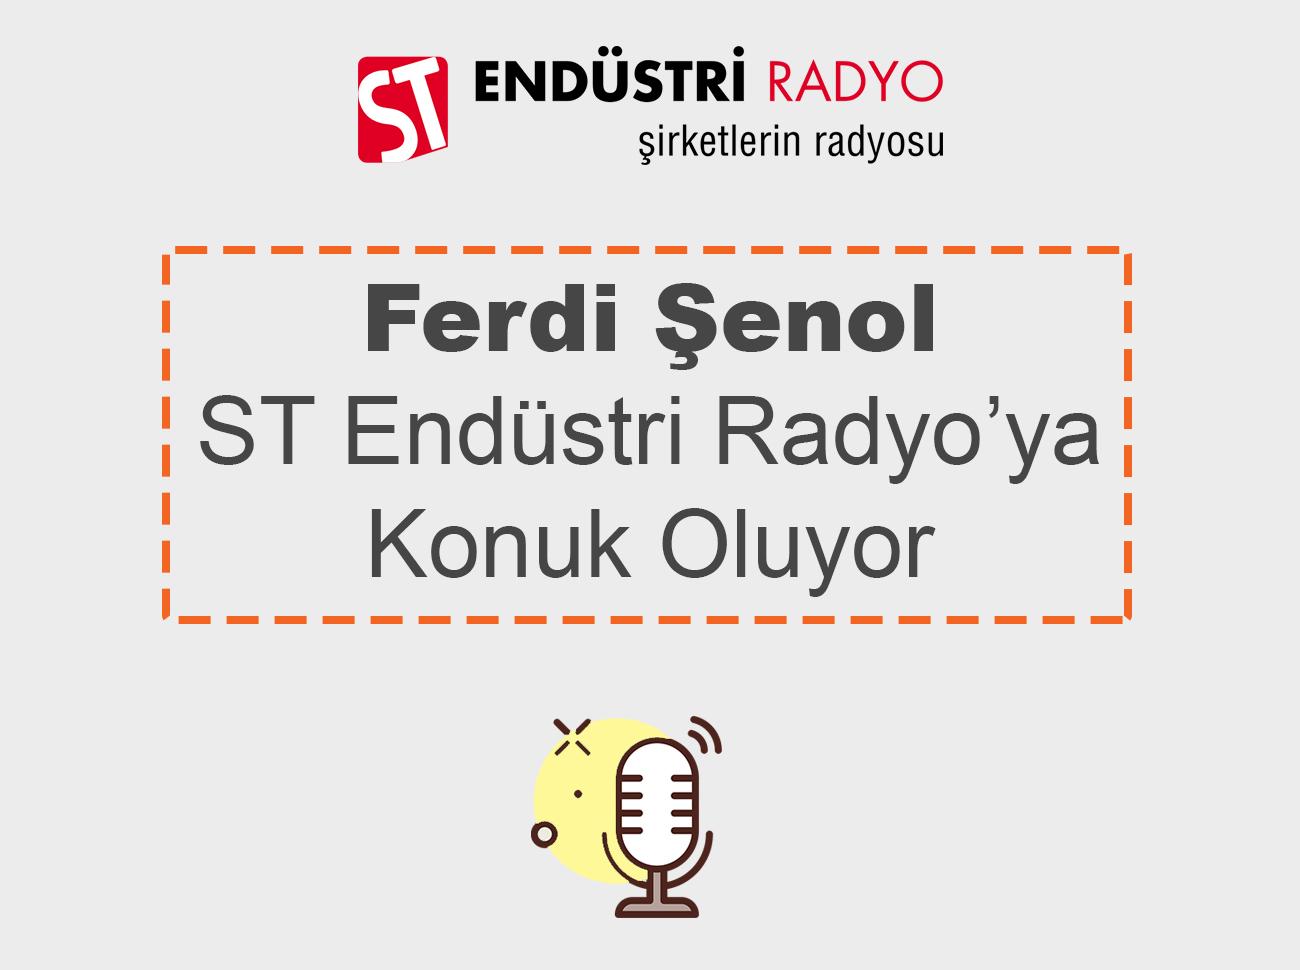 Ferdi Şenol ST Endüstri Radyo'ya Konuk